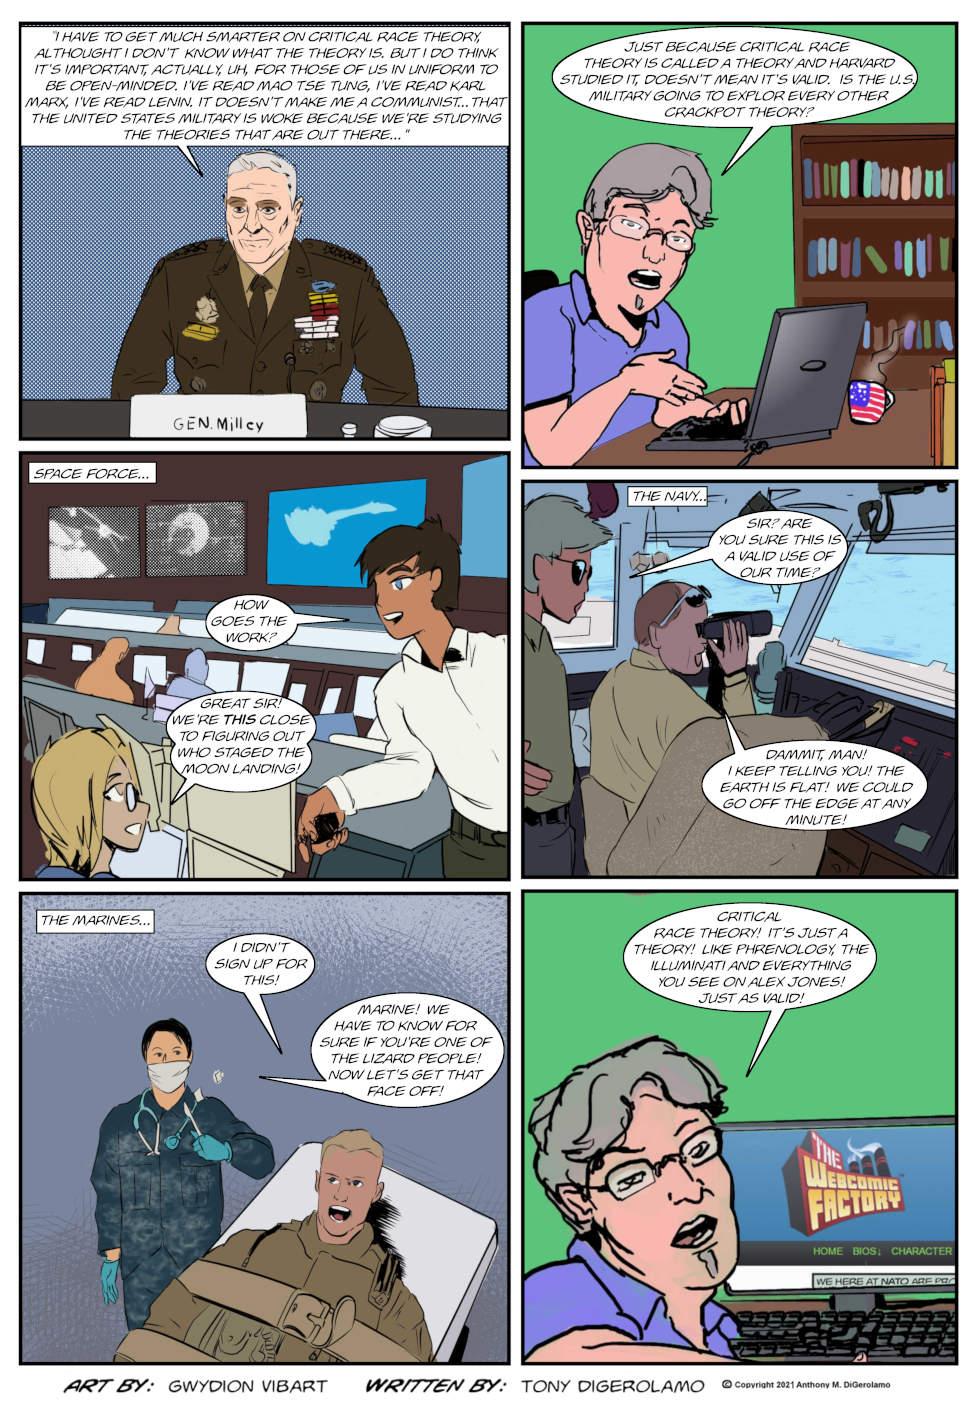 The Antiwar Comic: The Theory War